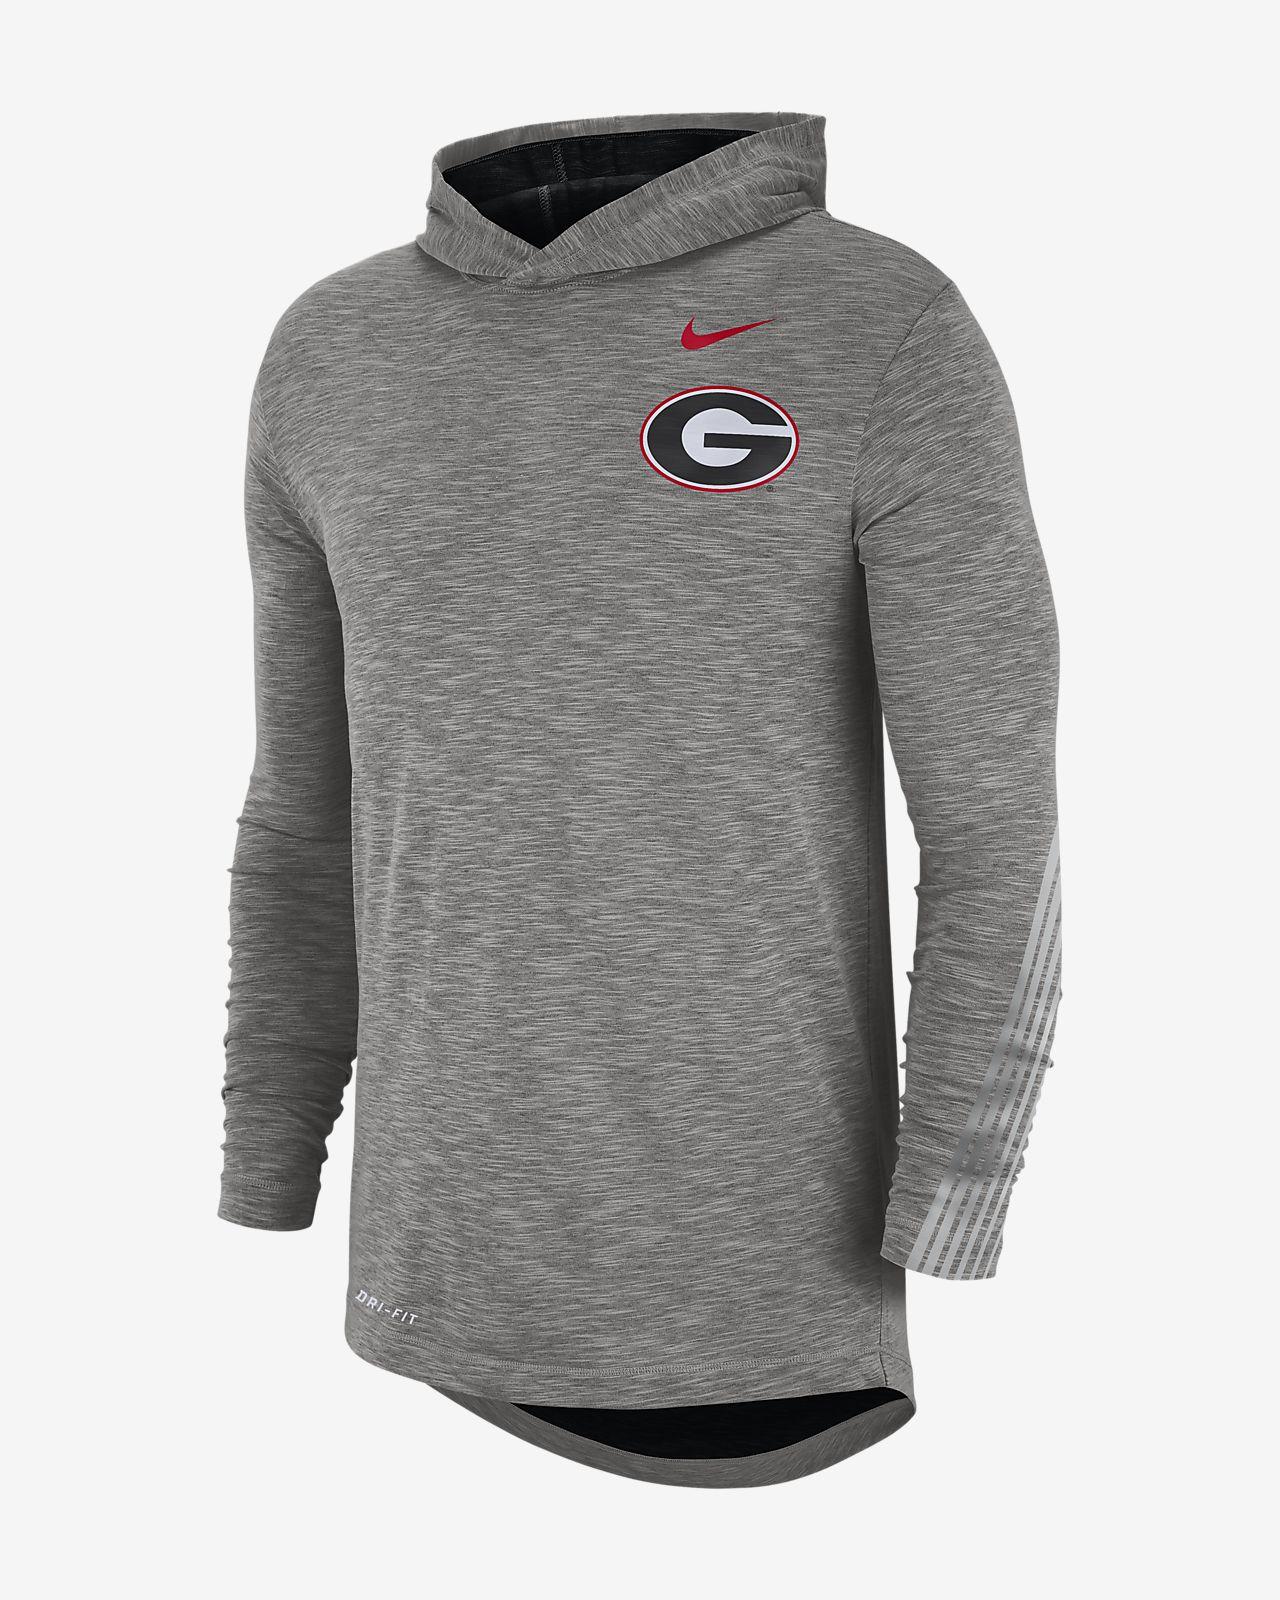 Nike College (Georgia) Men's Long-Sleeve Hooded T-Shirt